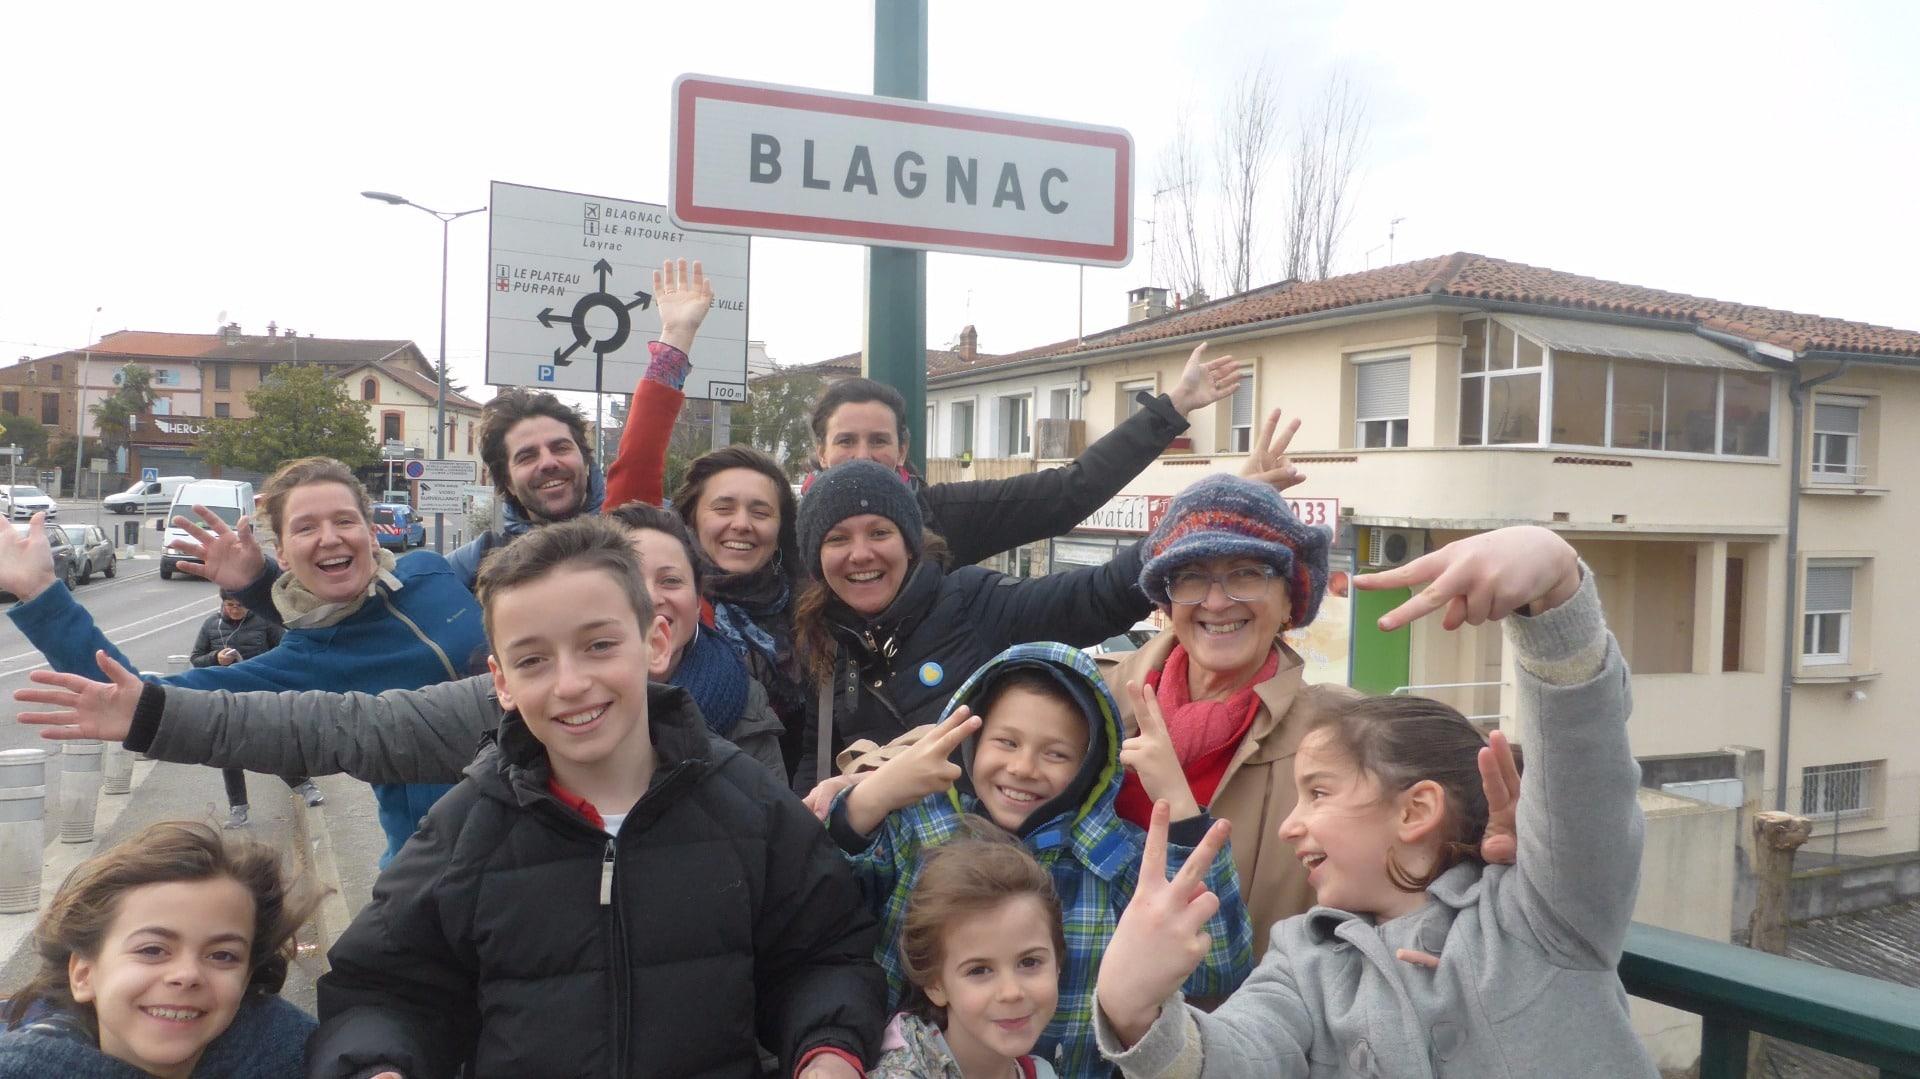 BLAGNAC